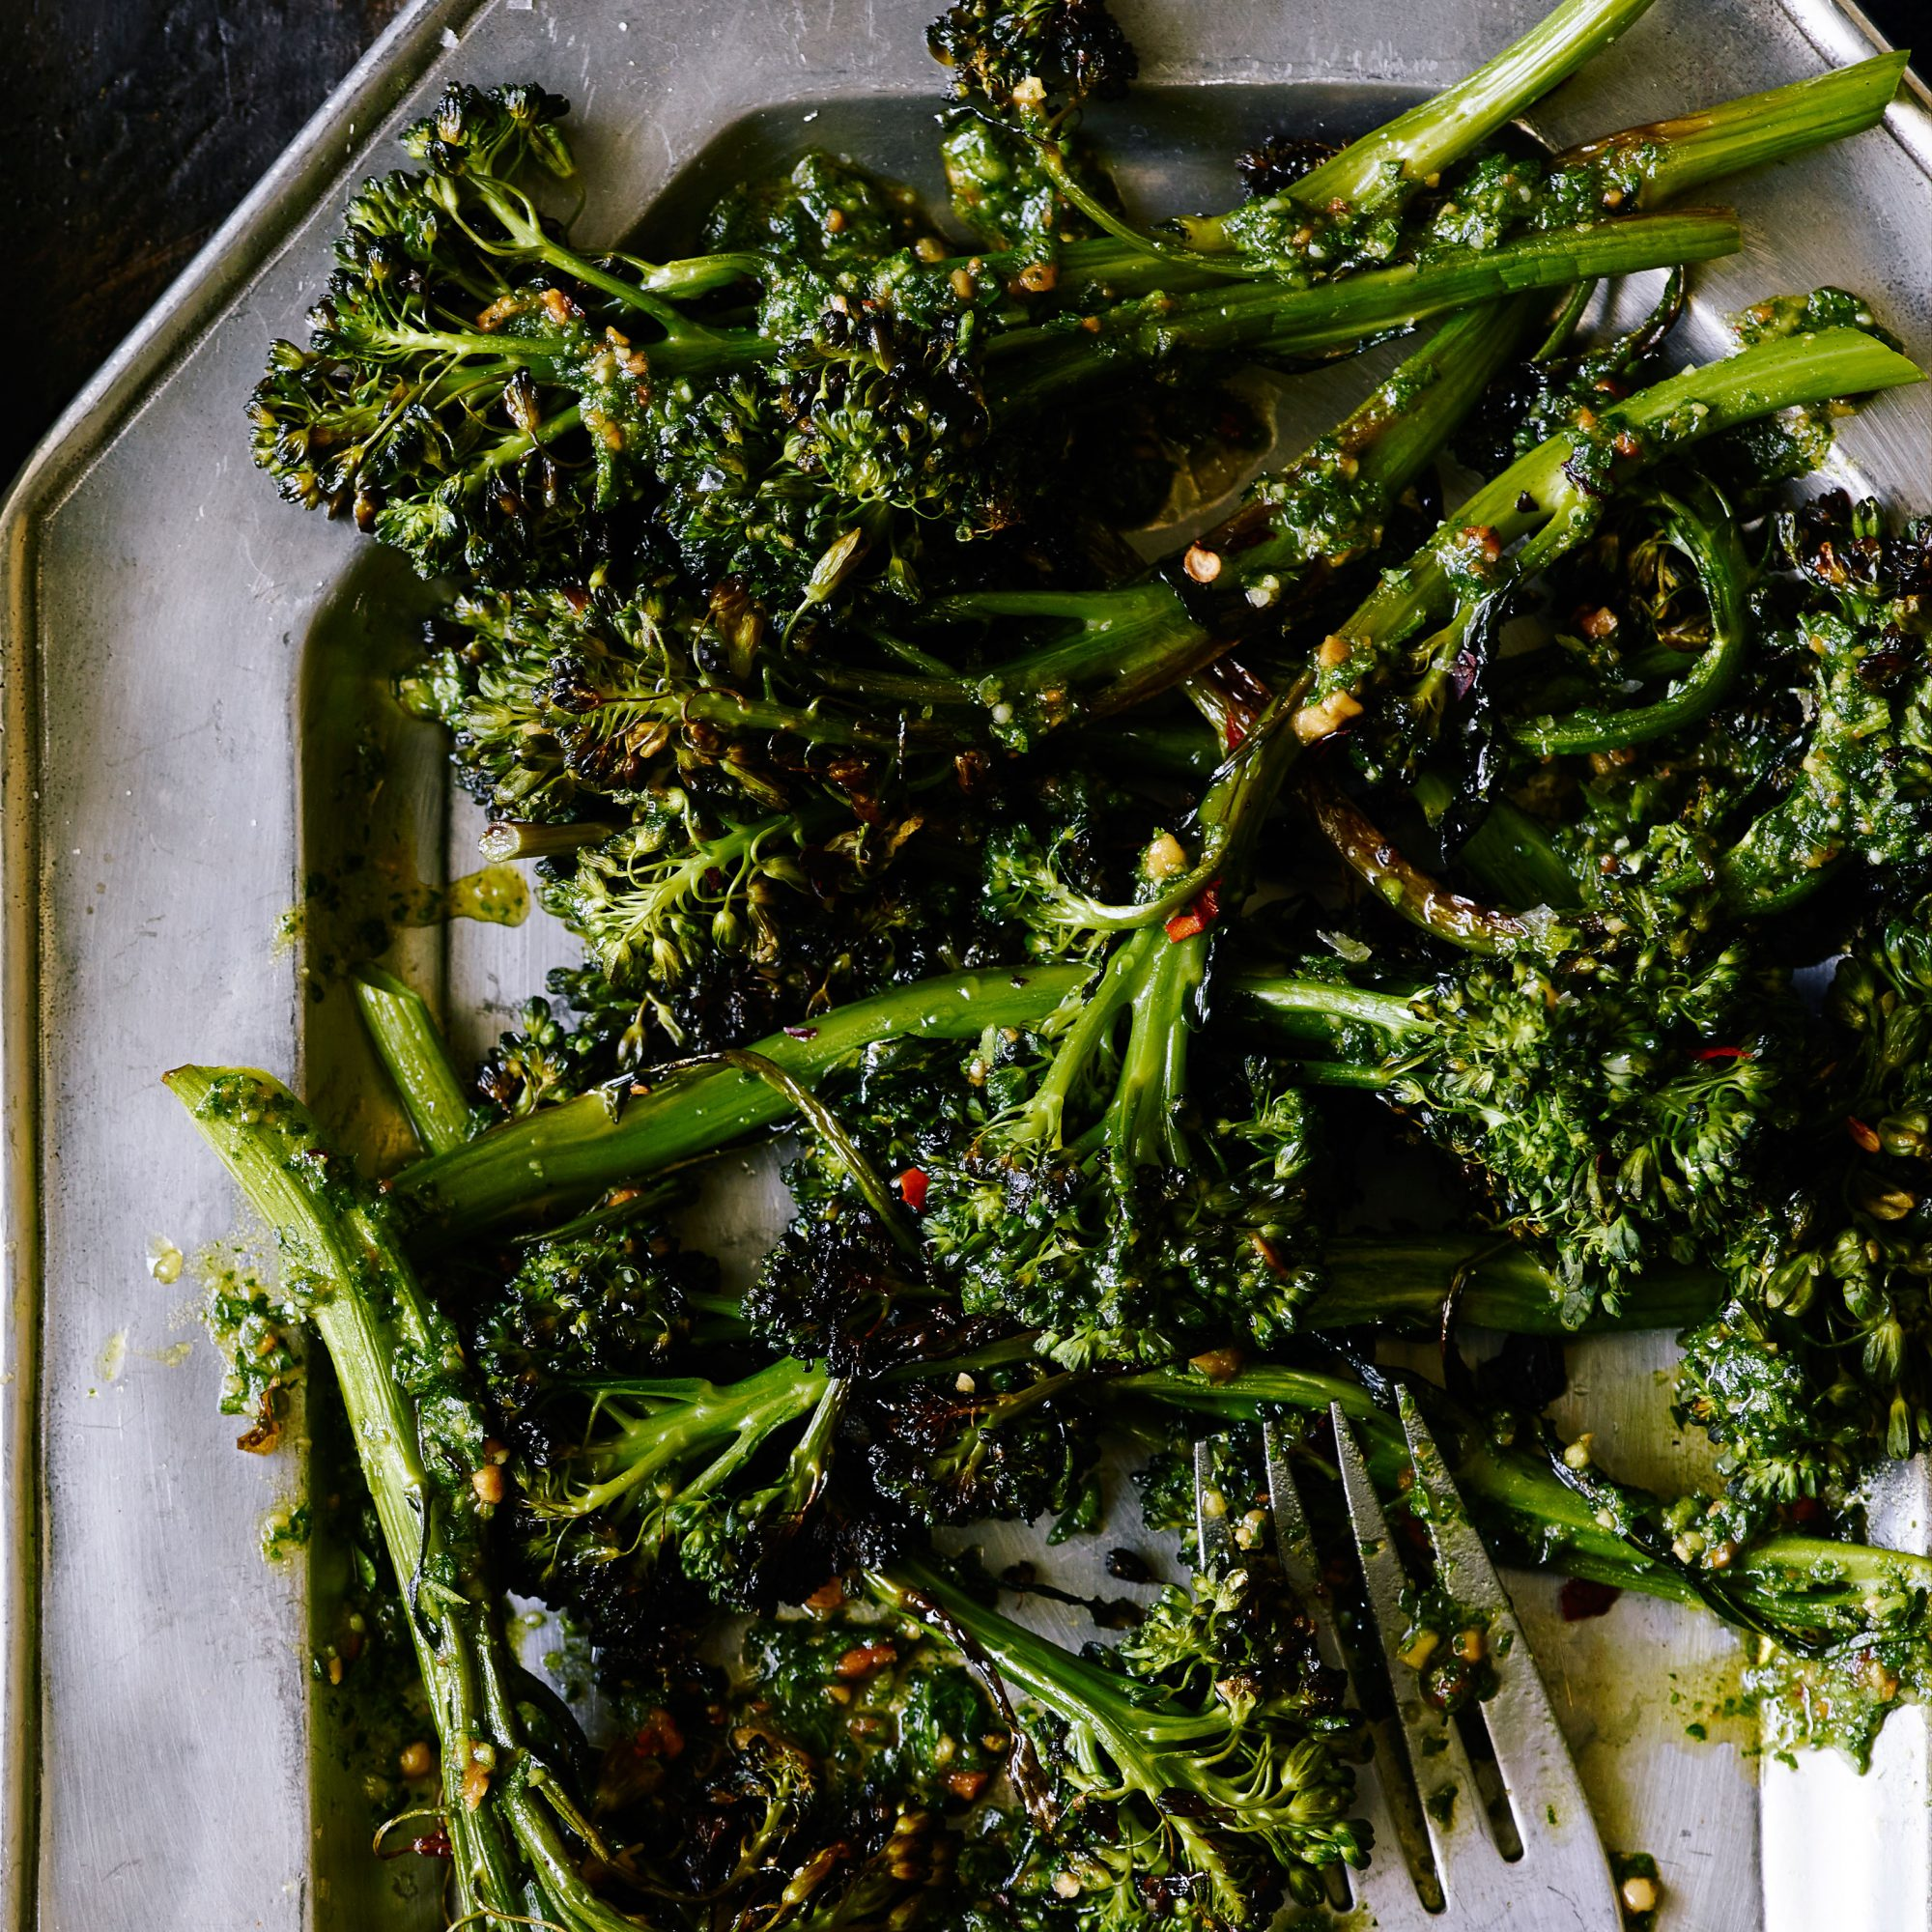 Roasted Broccolini with Almond Parsley Pesto